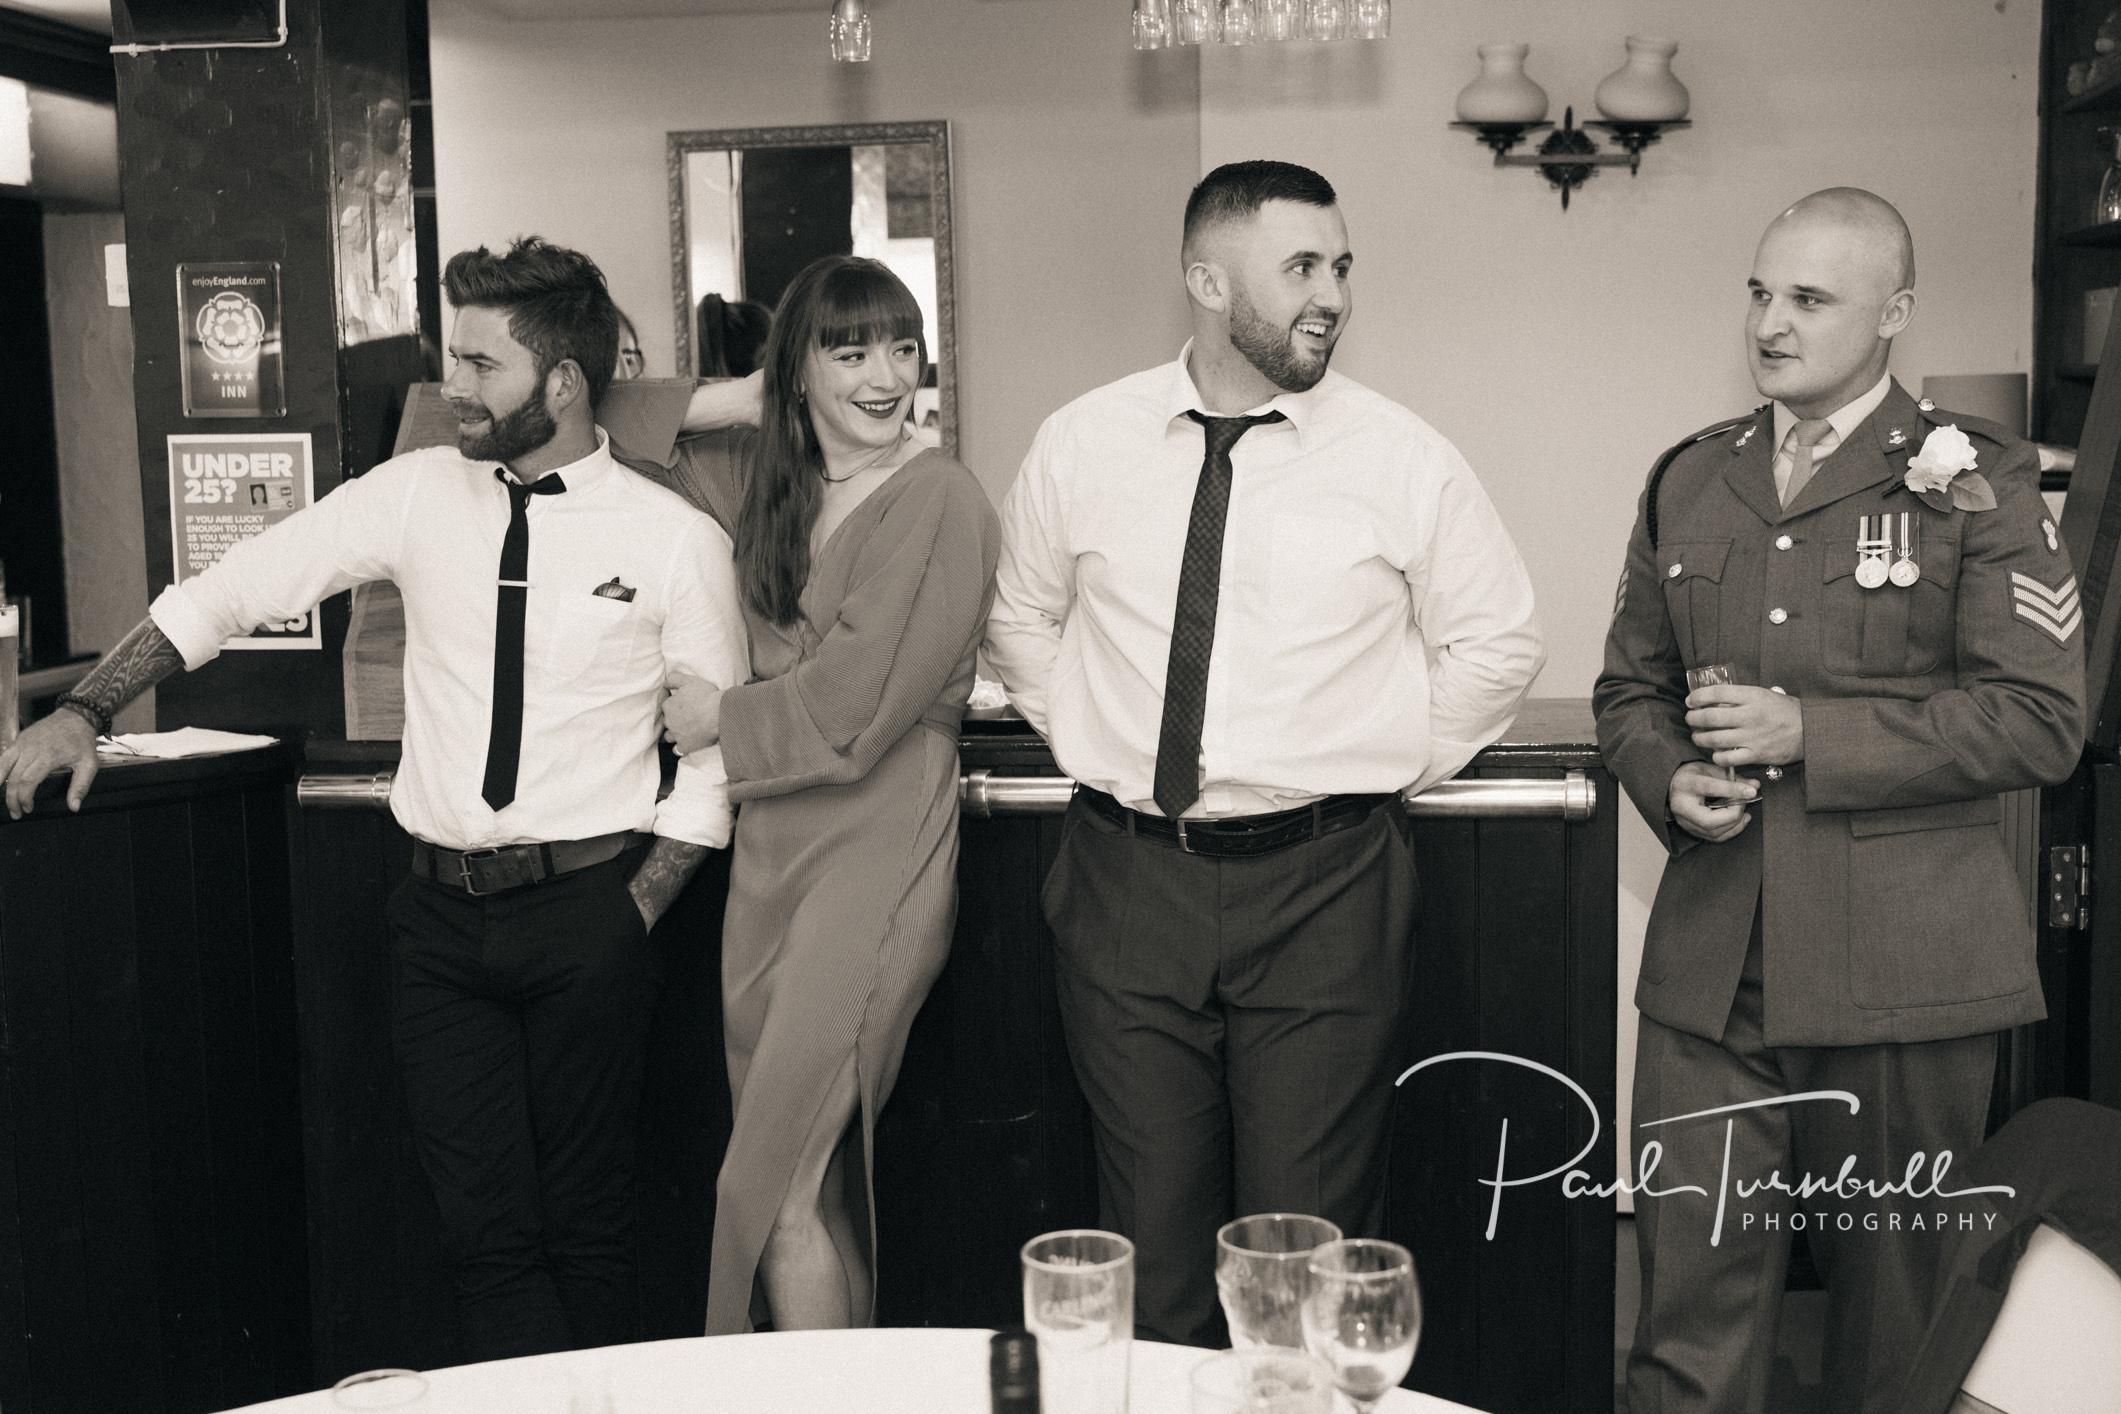 wedding-photographer-south-dalton-walkington-yorkshire-emma-james-066.jpg